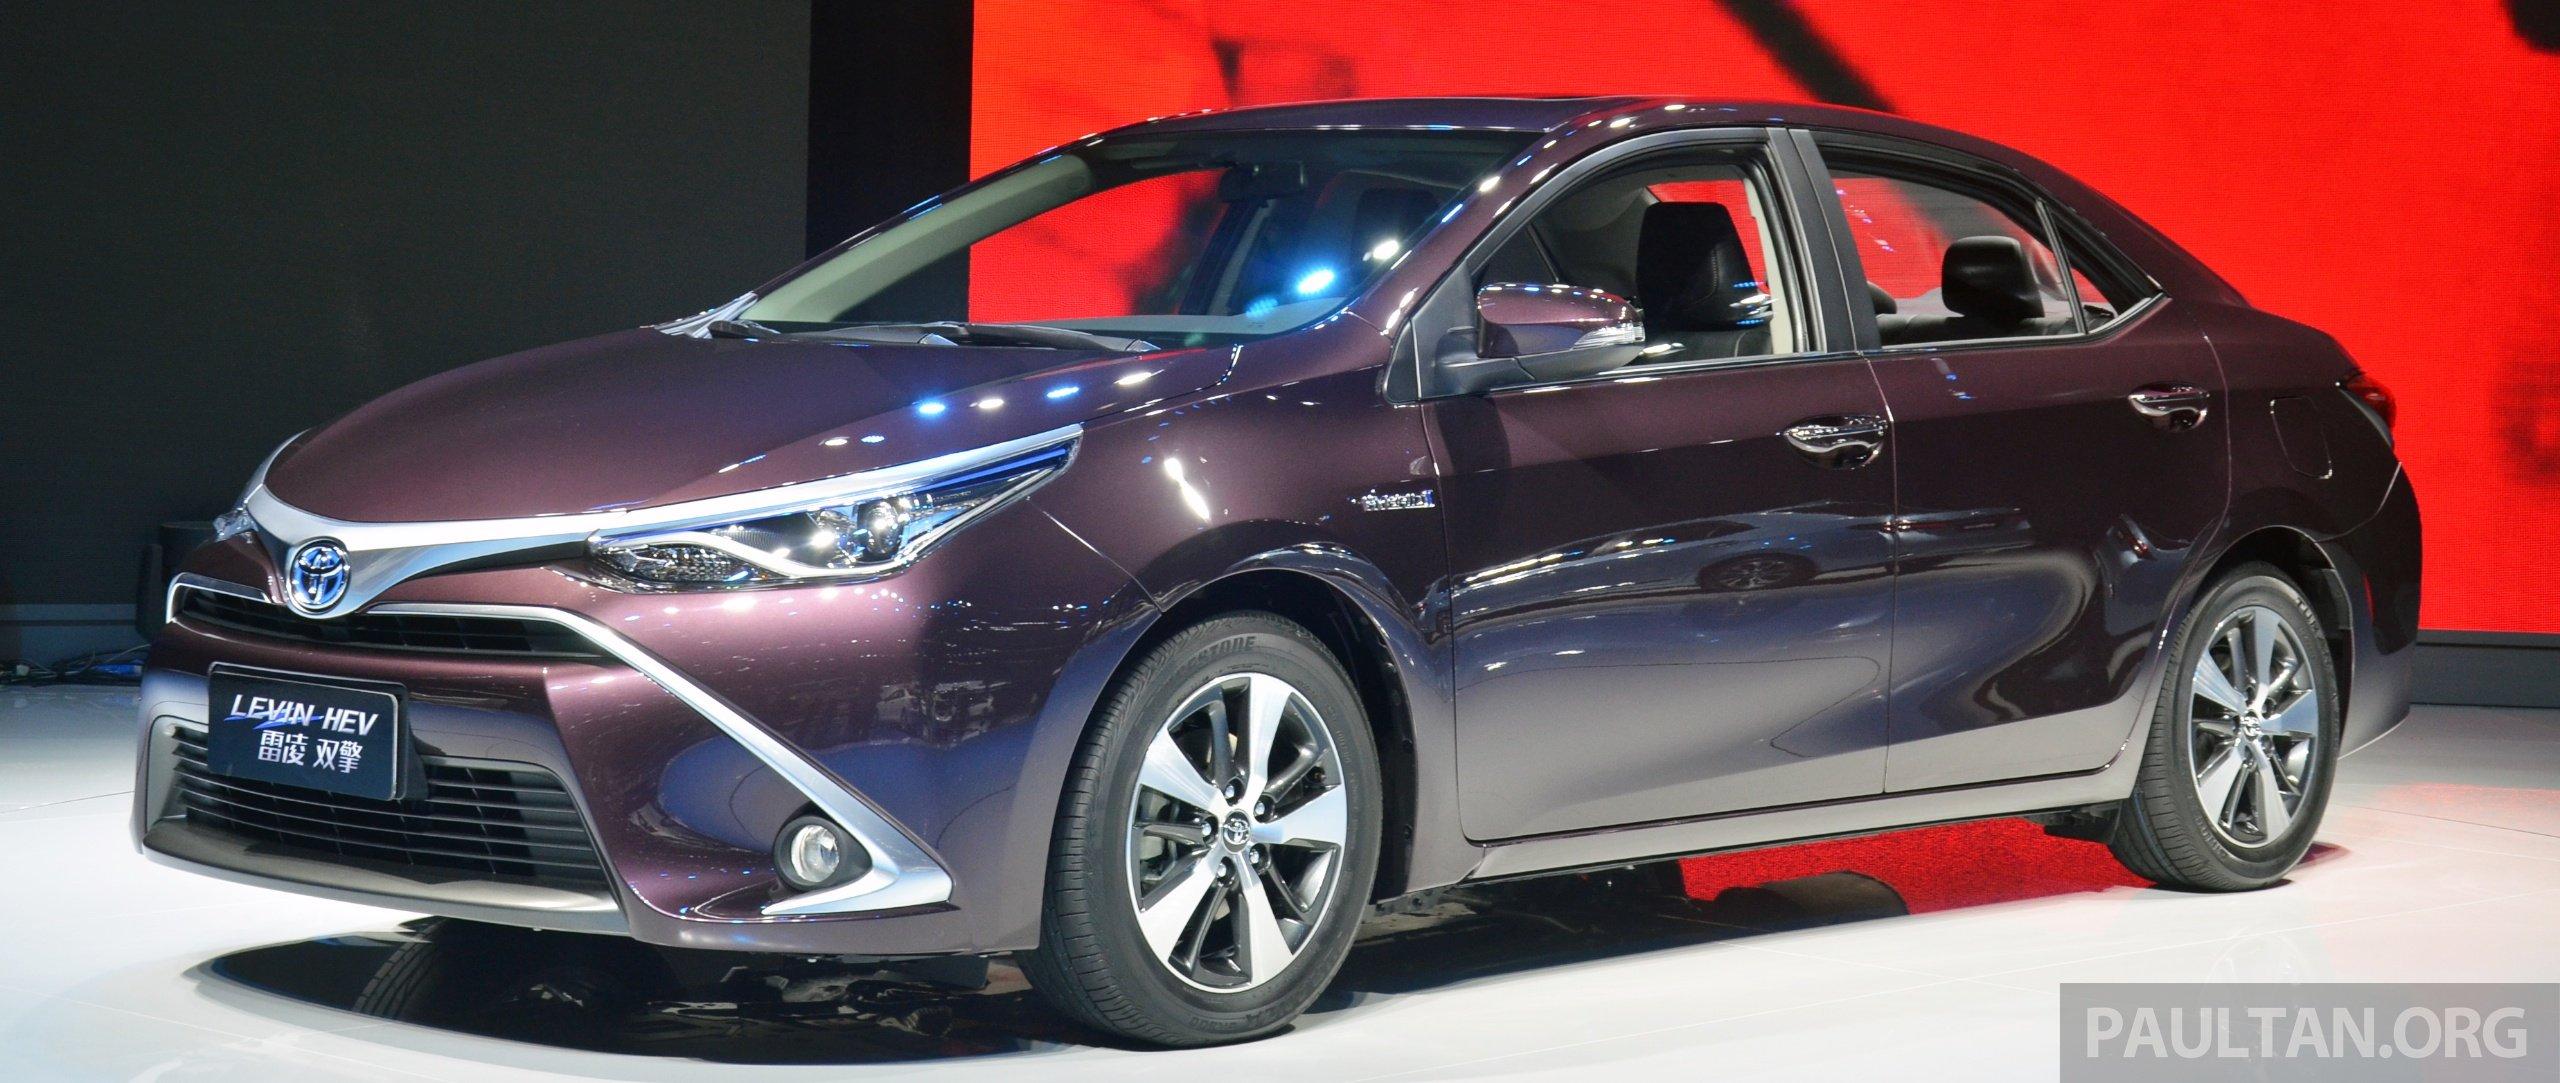 Shanghai 2015 Toyota Corolla Hybrid Levin Hev Debut Paul